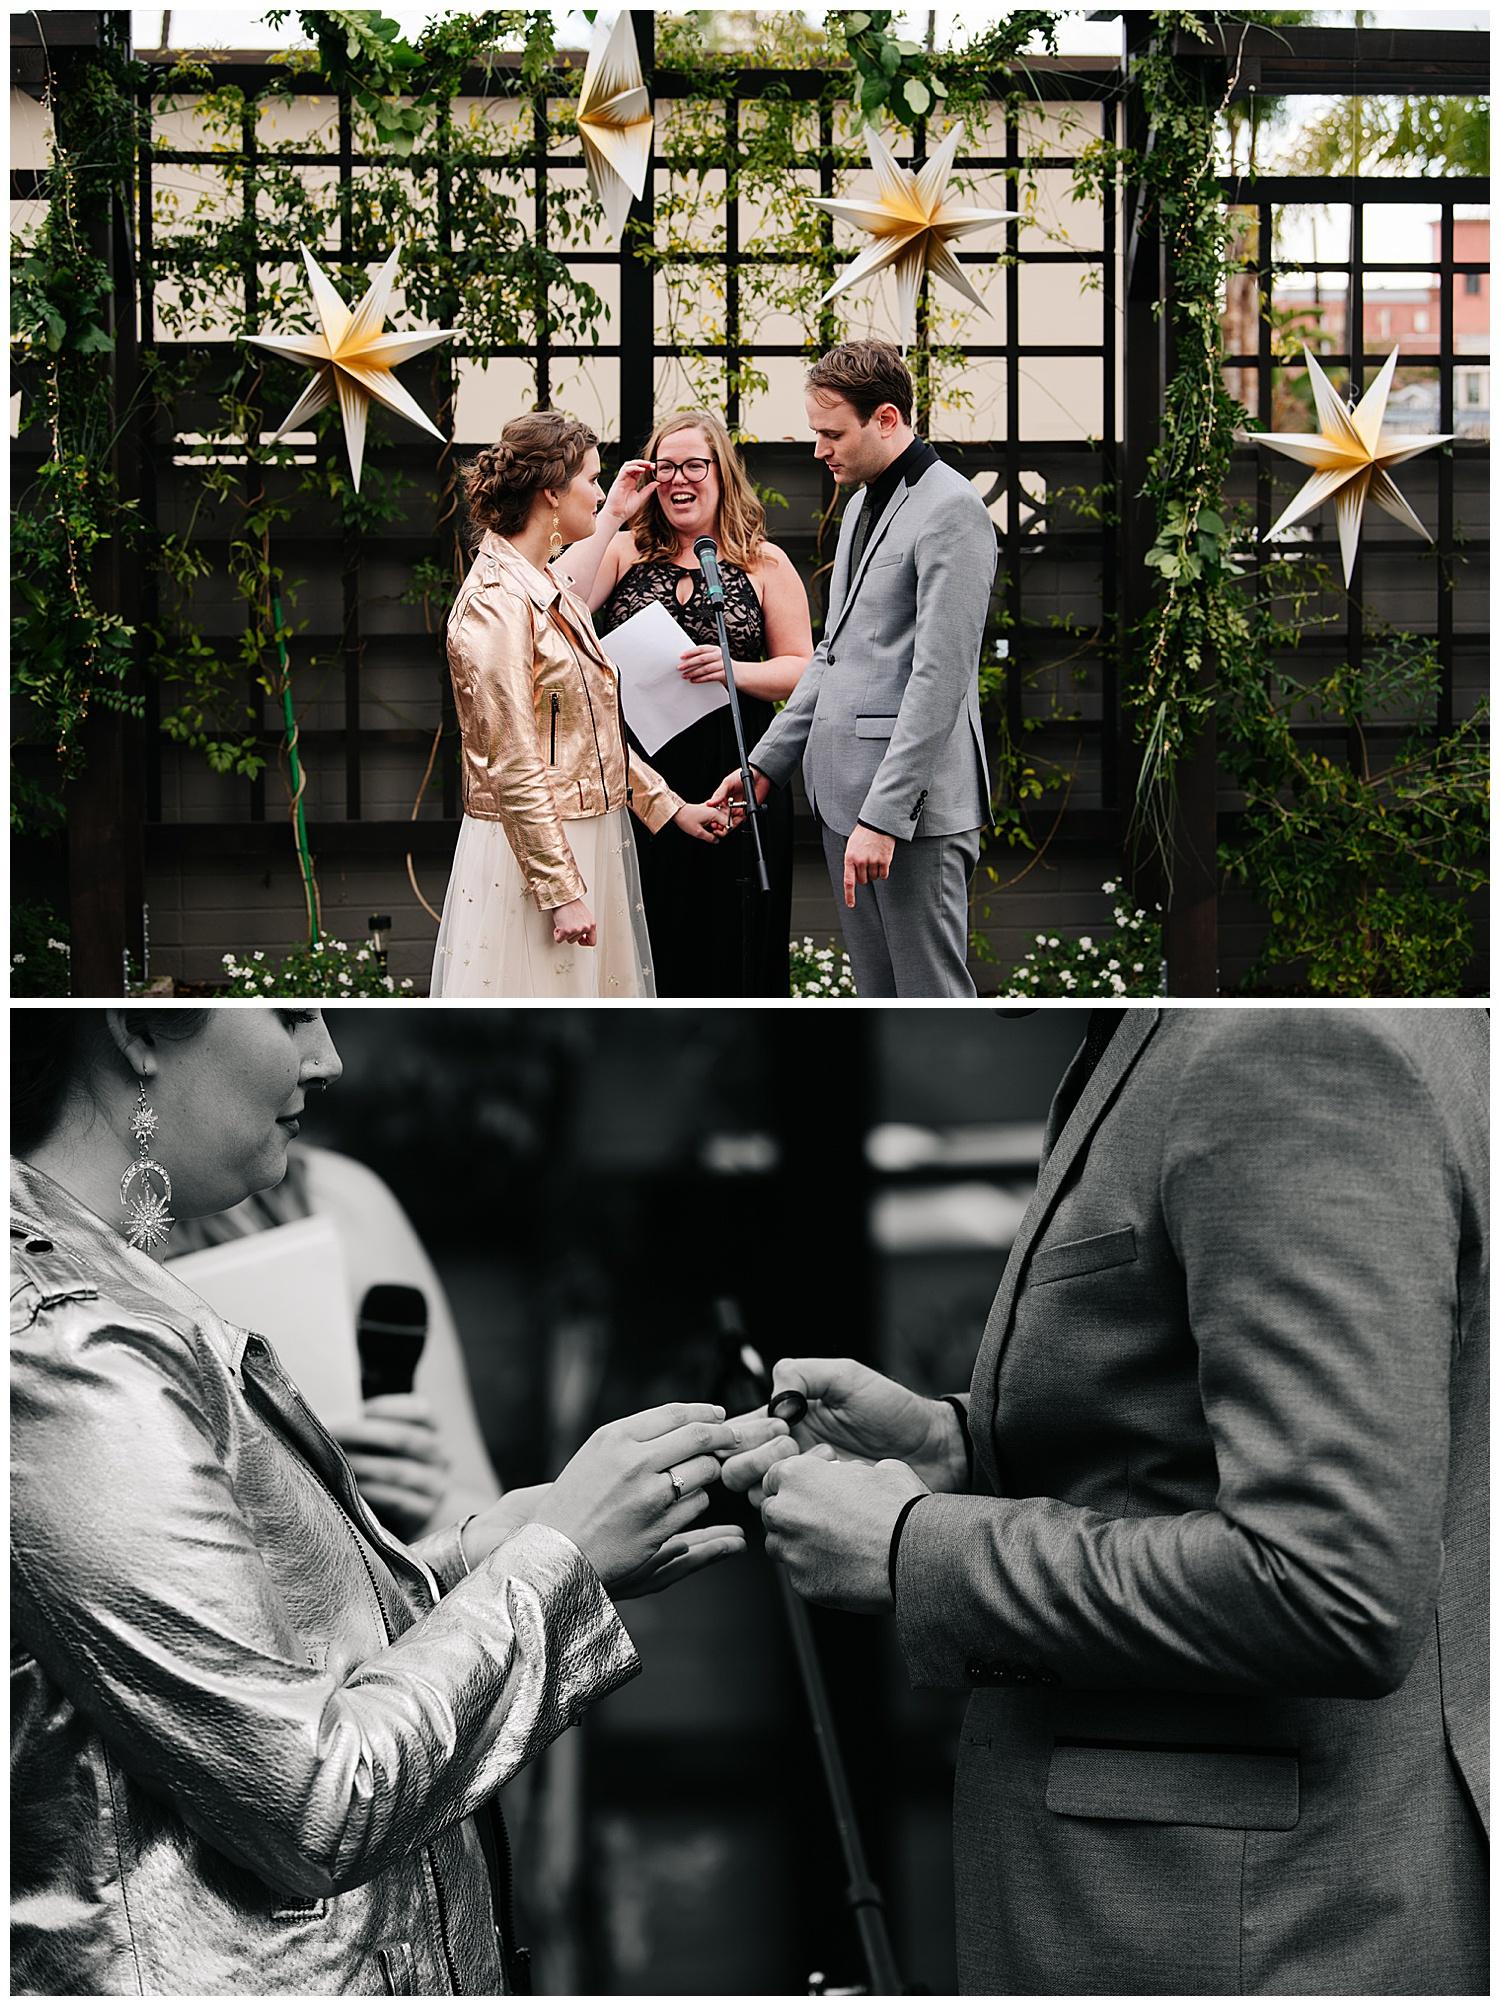 SamEricaStudios - San Diego Wedding Photographer - Galaxy Themed Rainy Day Wedding Parq West San Diego_0047.jpg